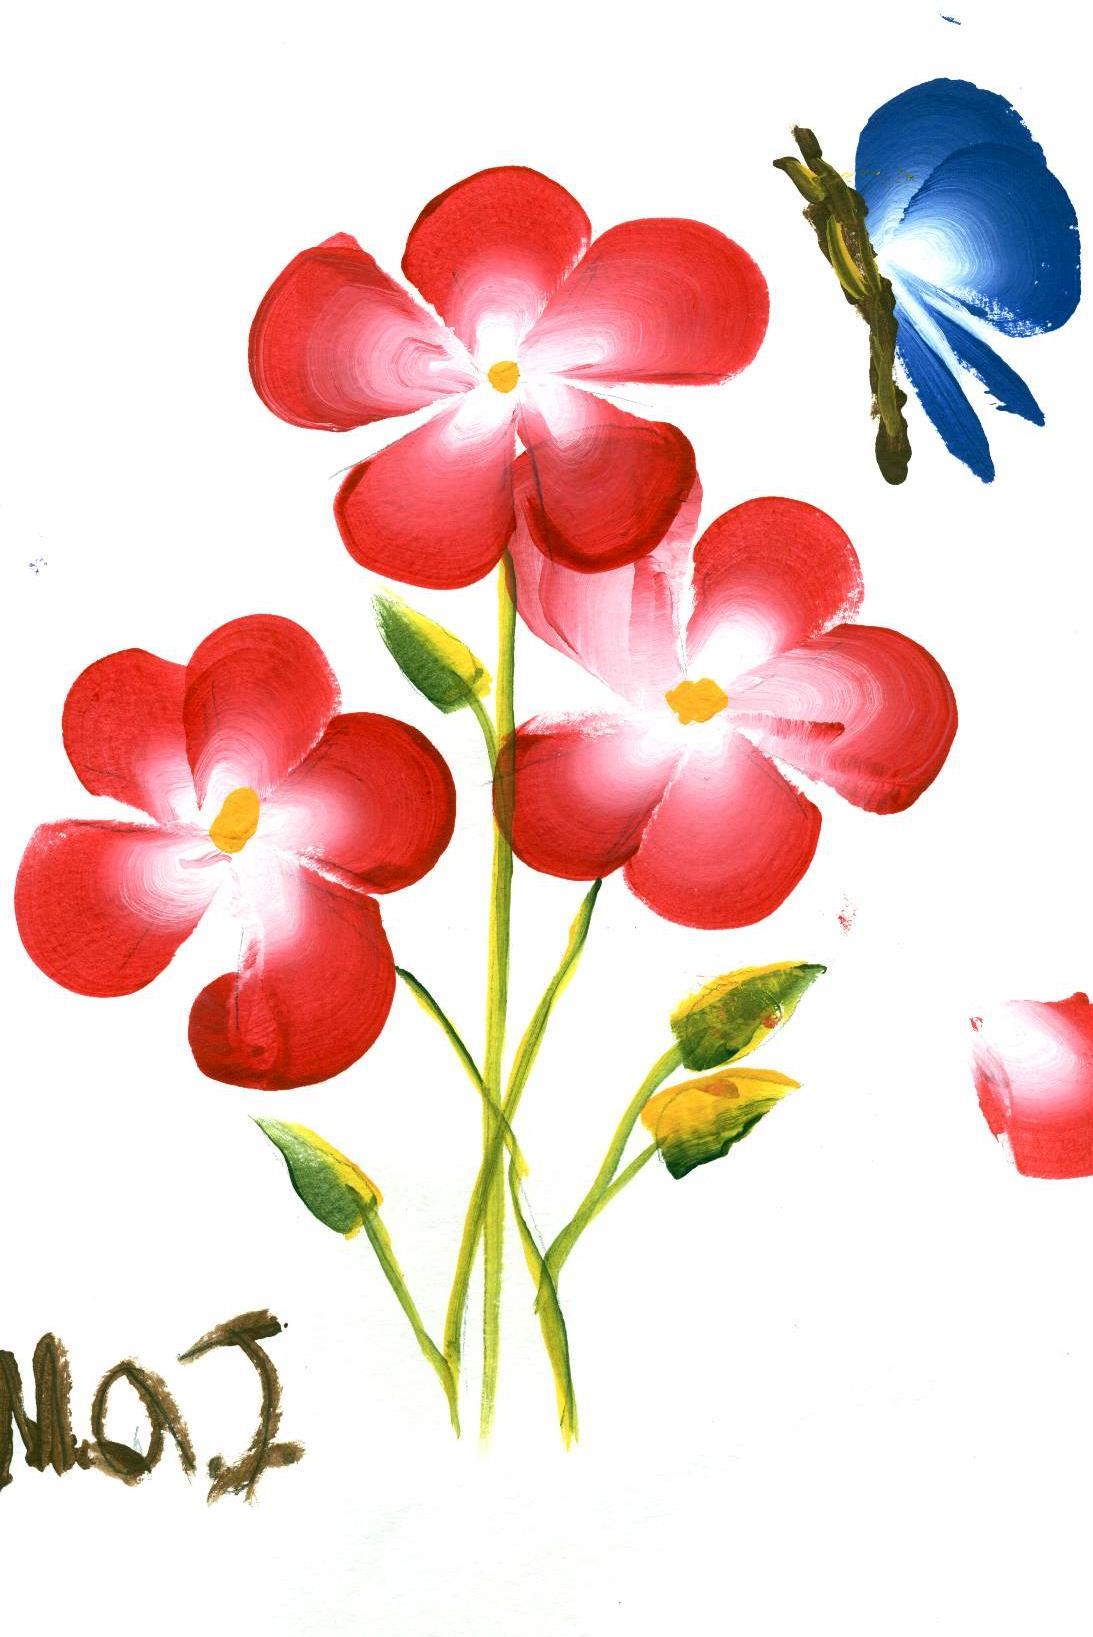 M's flowers 09